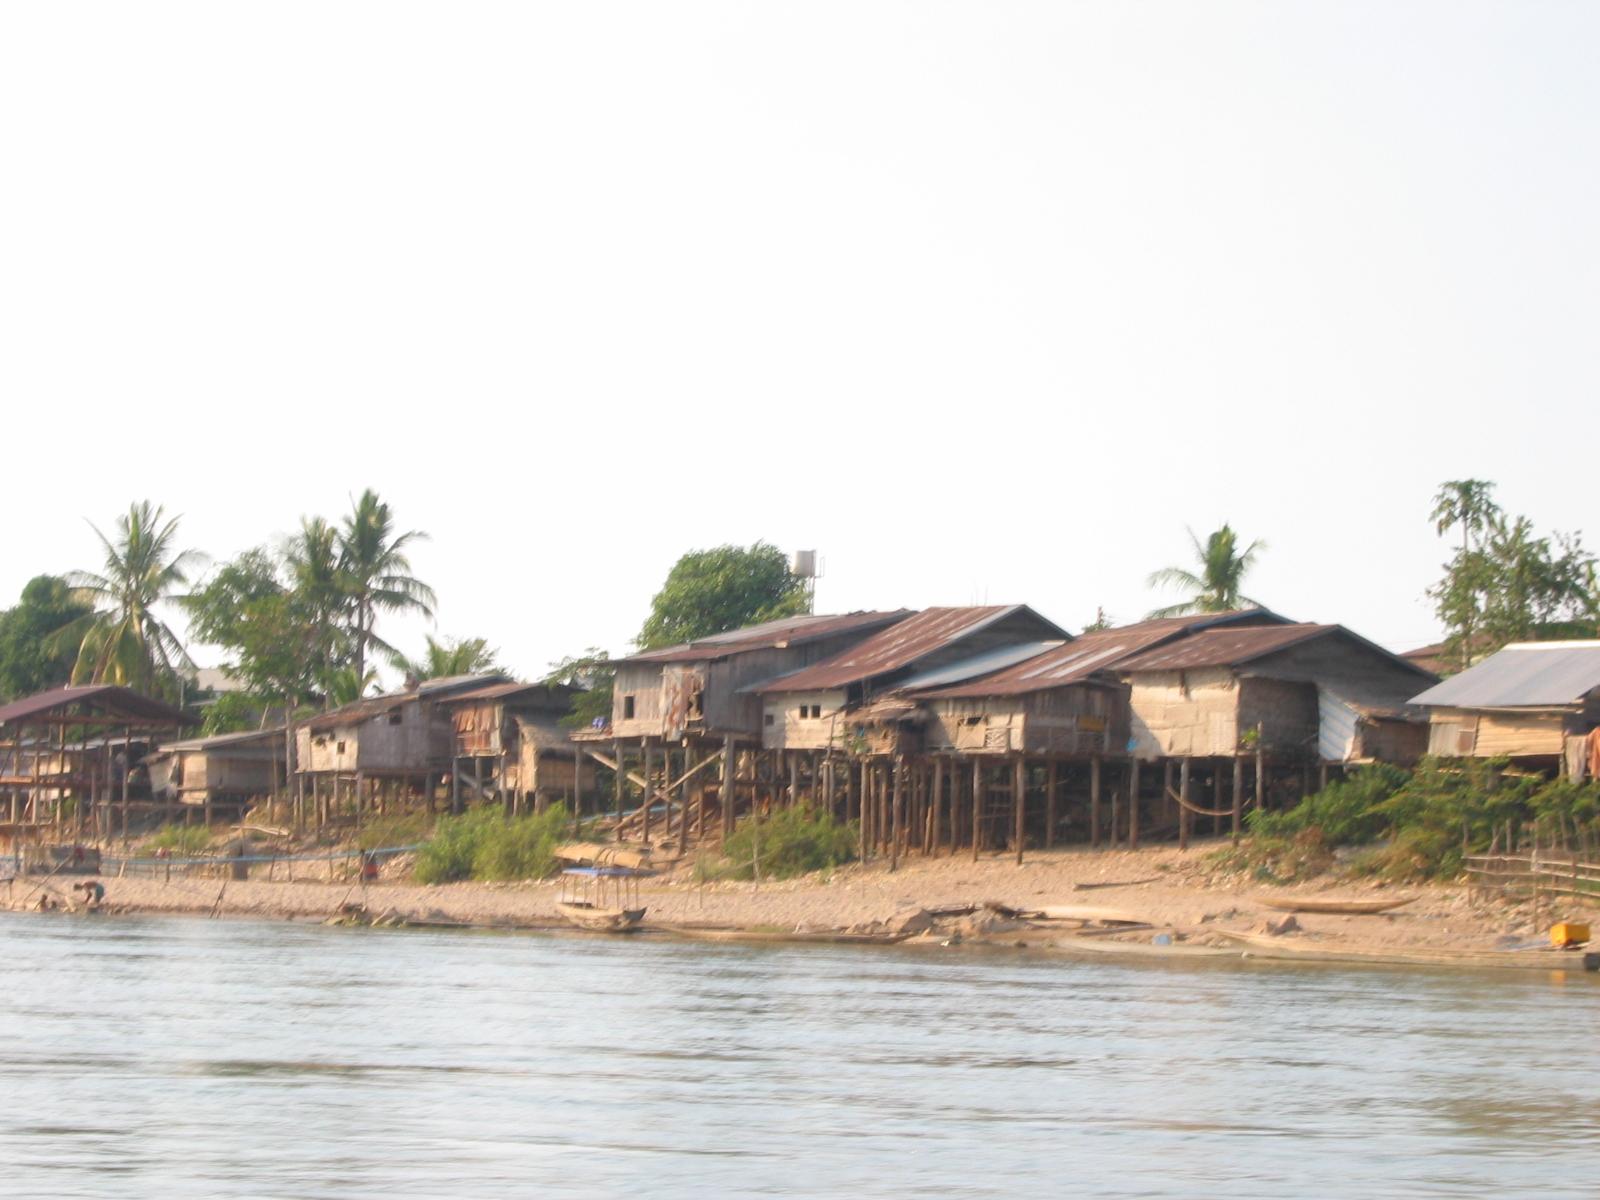 4000-iles-laos (8)